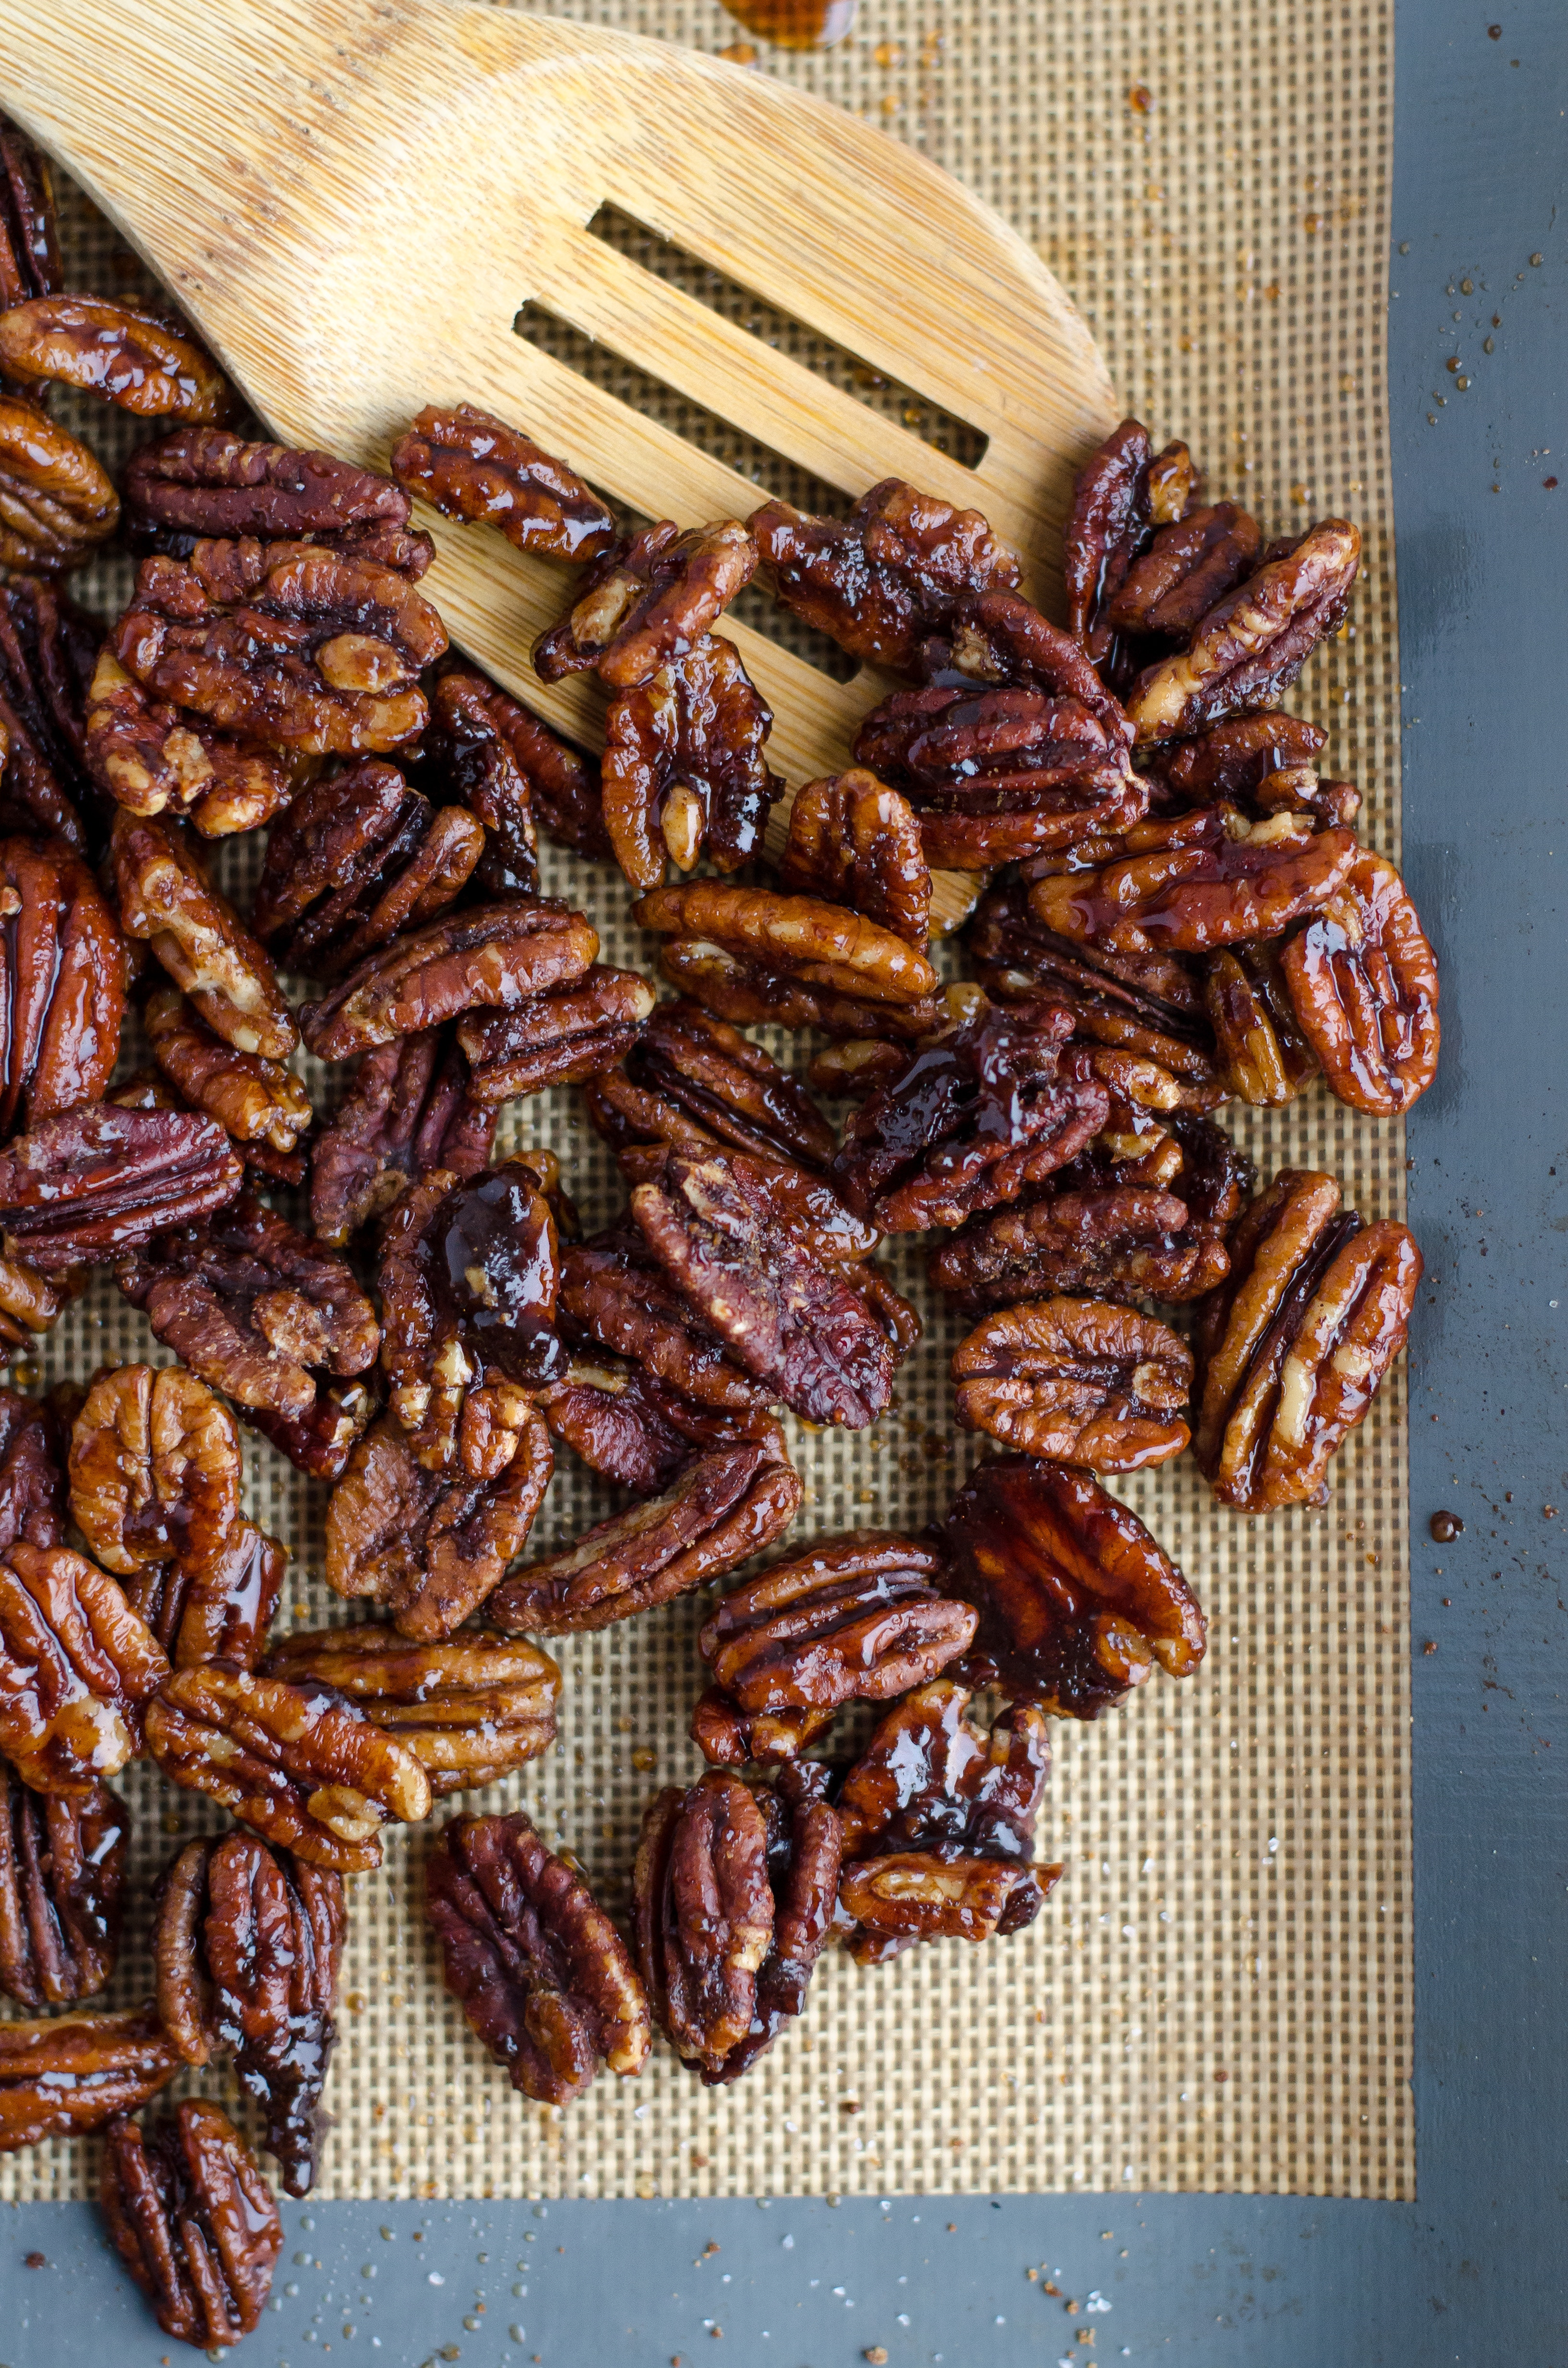 Søde Nødder – Pekan nødder